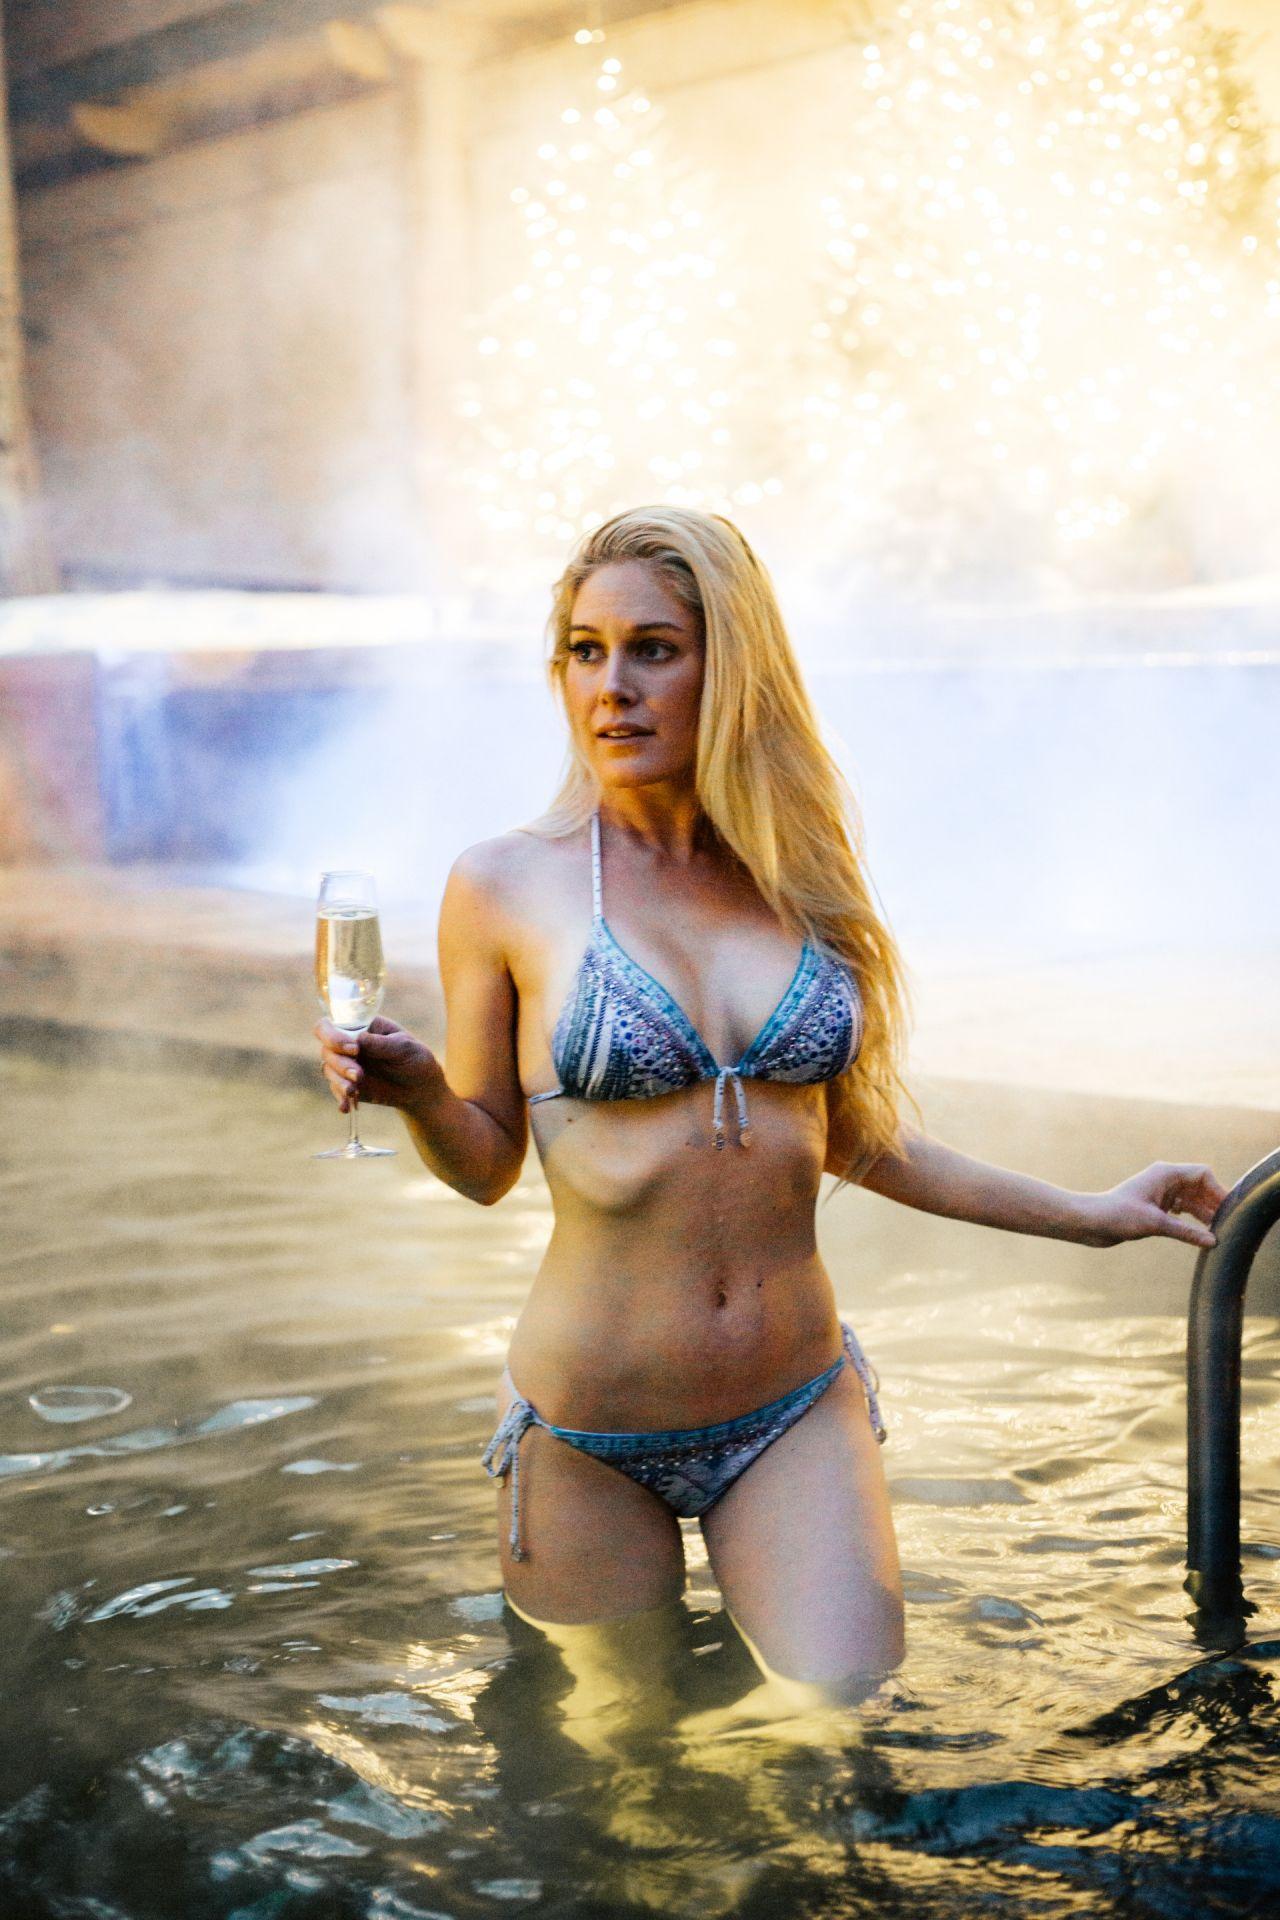 Heidi Pratt In Bikini 01 09 2019